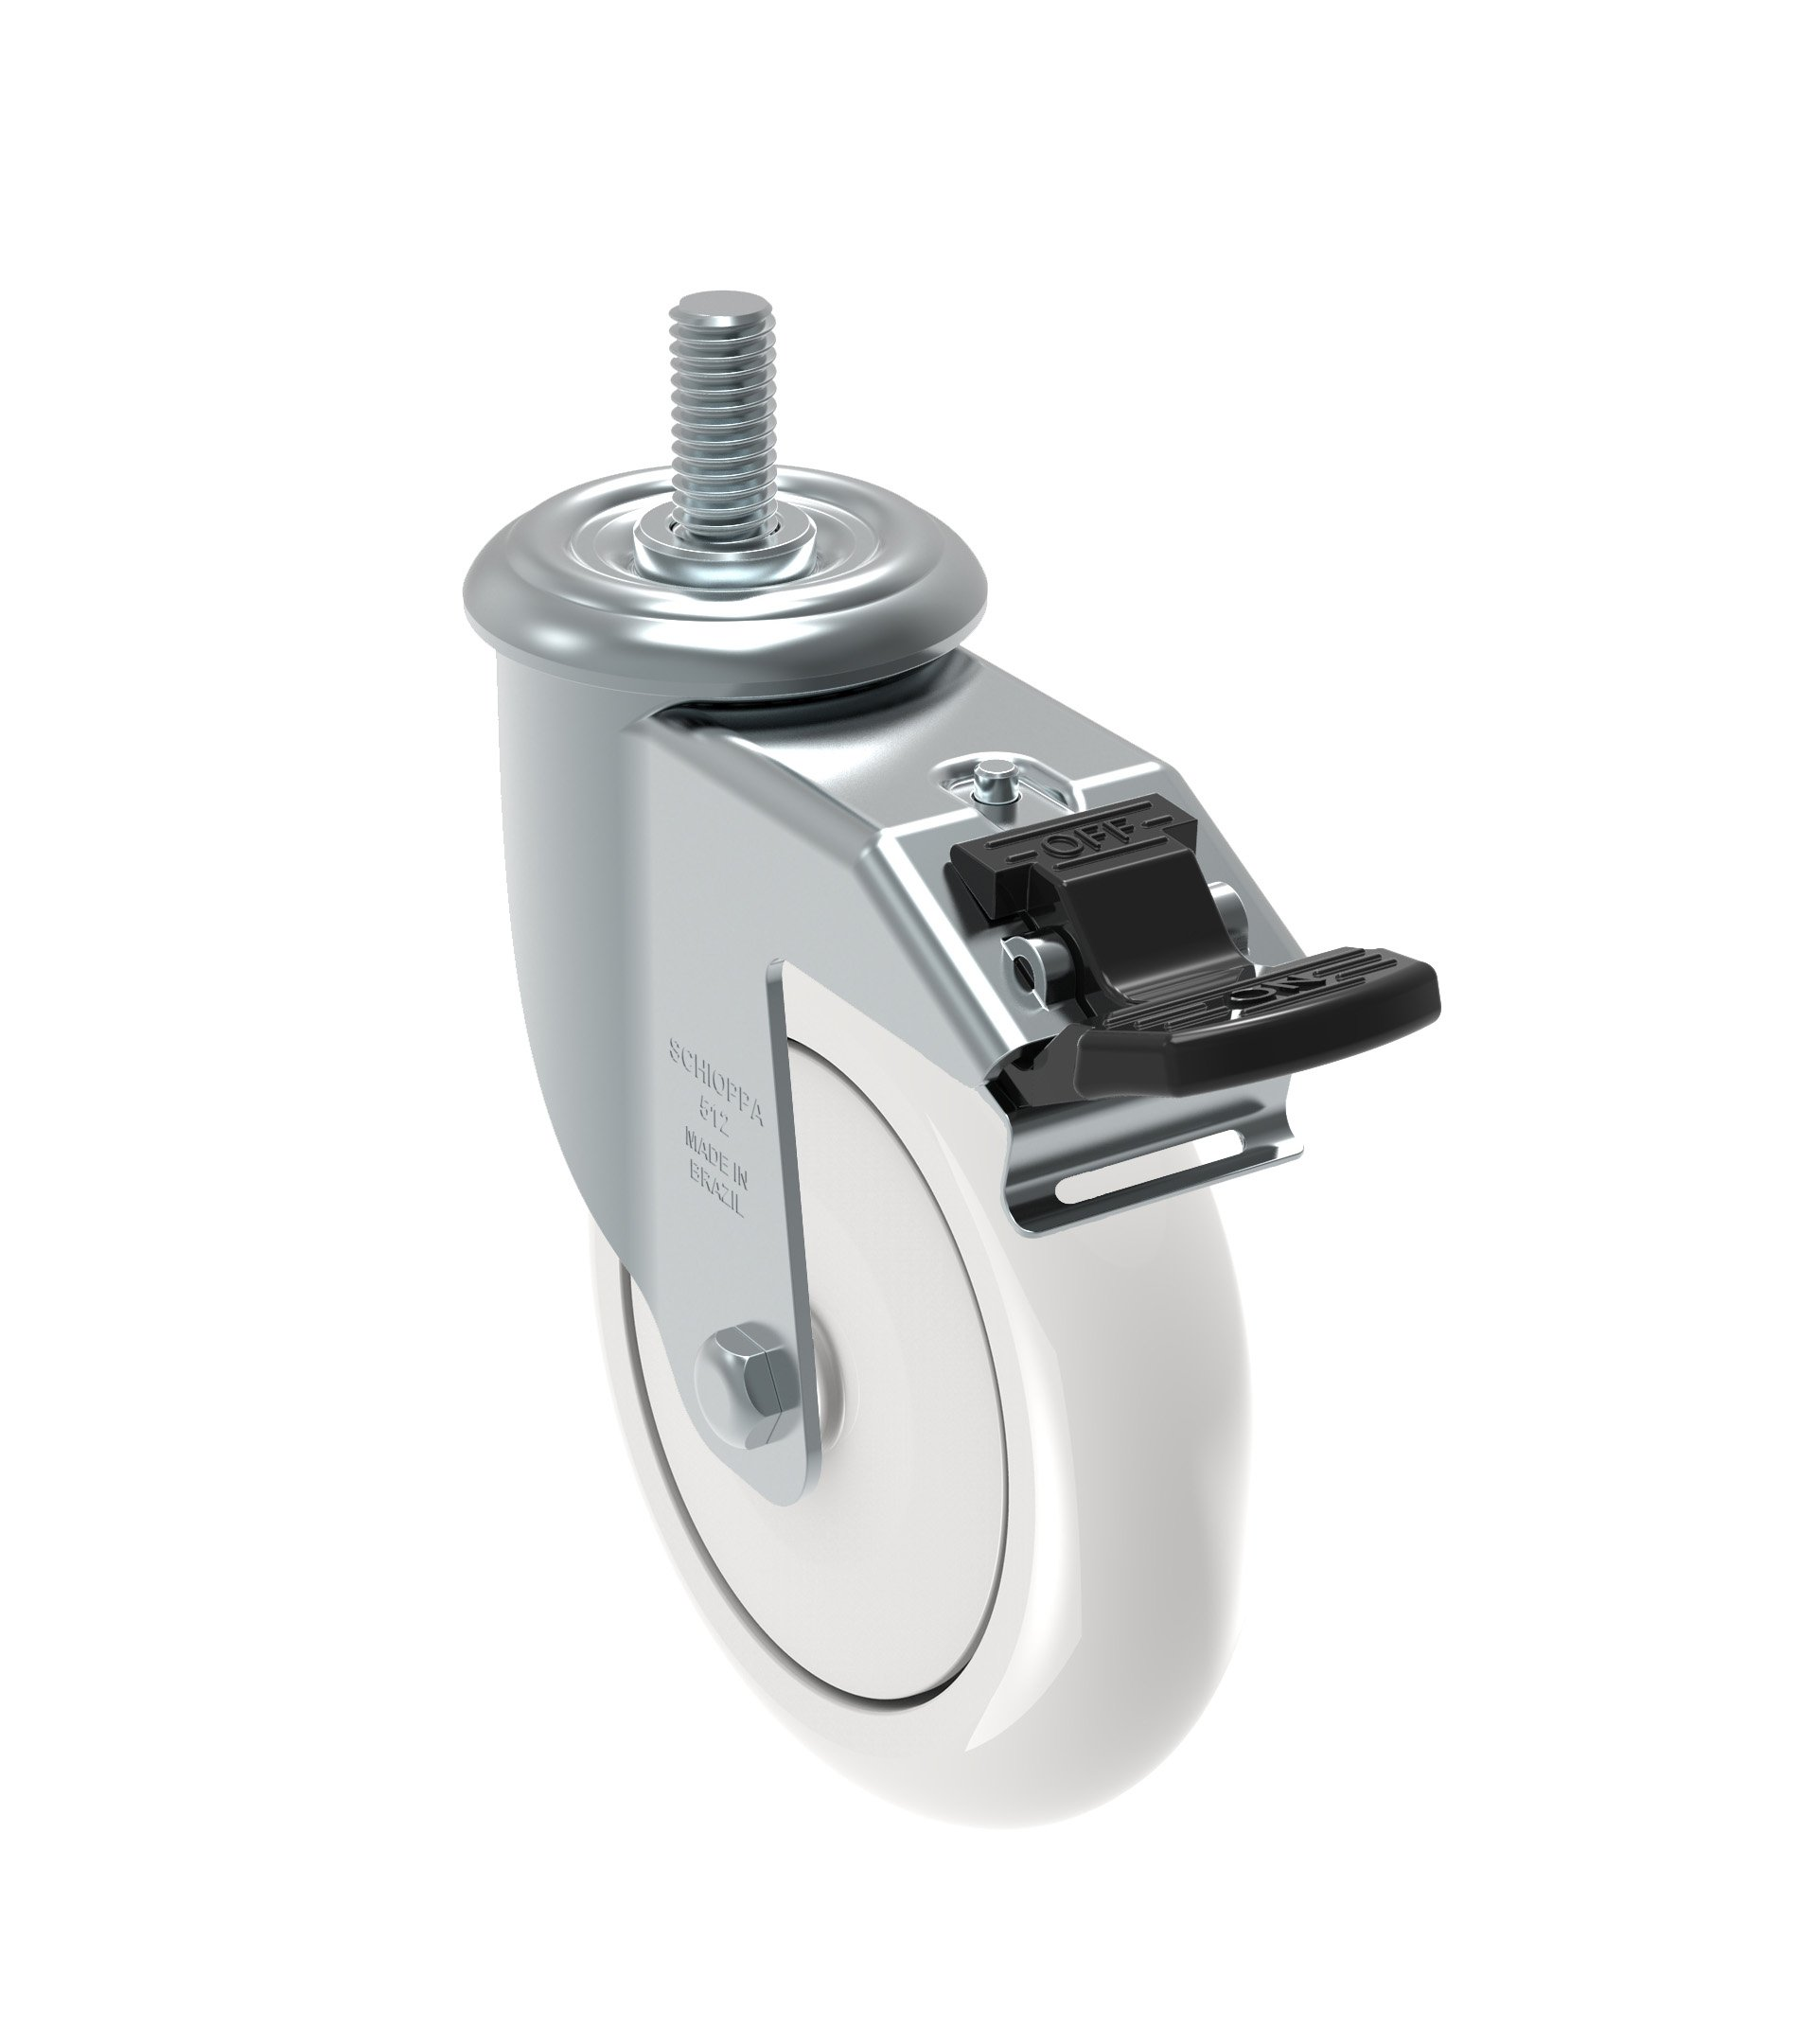 Schioppa GLEEF 512 NTE G L12 Series 5'' x 1-1/4'' Diameter Swivel Caster with Total Lock Brake, Non-Marking Nylon Precision Ball Bearing Wheel, 3/8'' Diameter x 1-1/2'' Length Threaded Stem, 375 lb